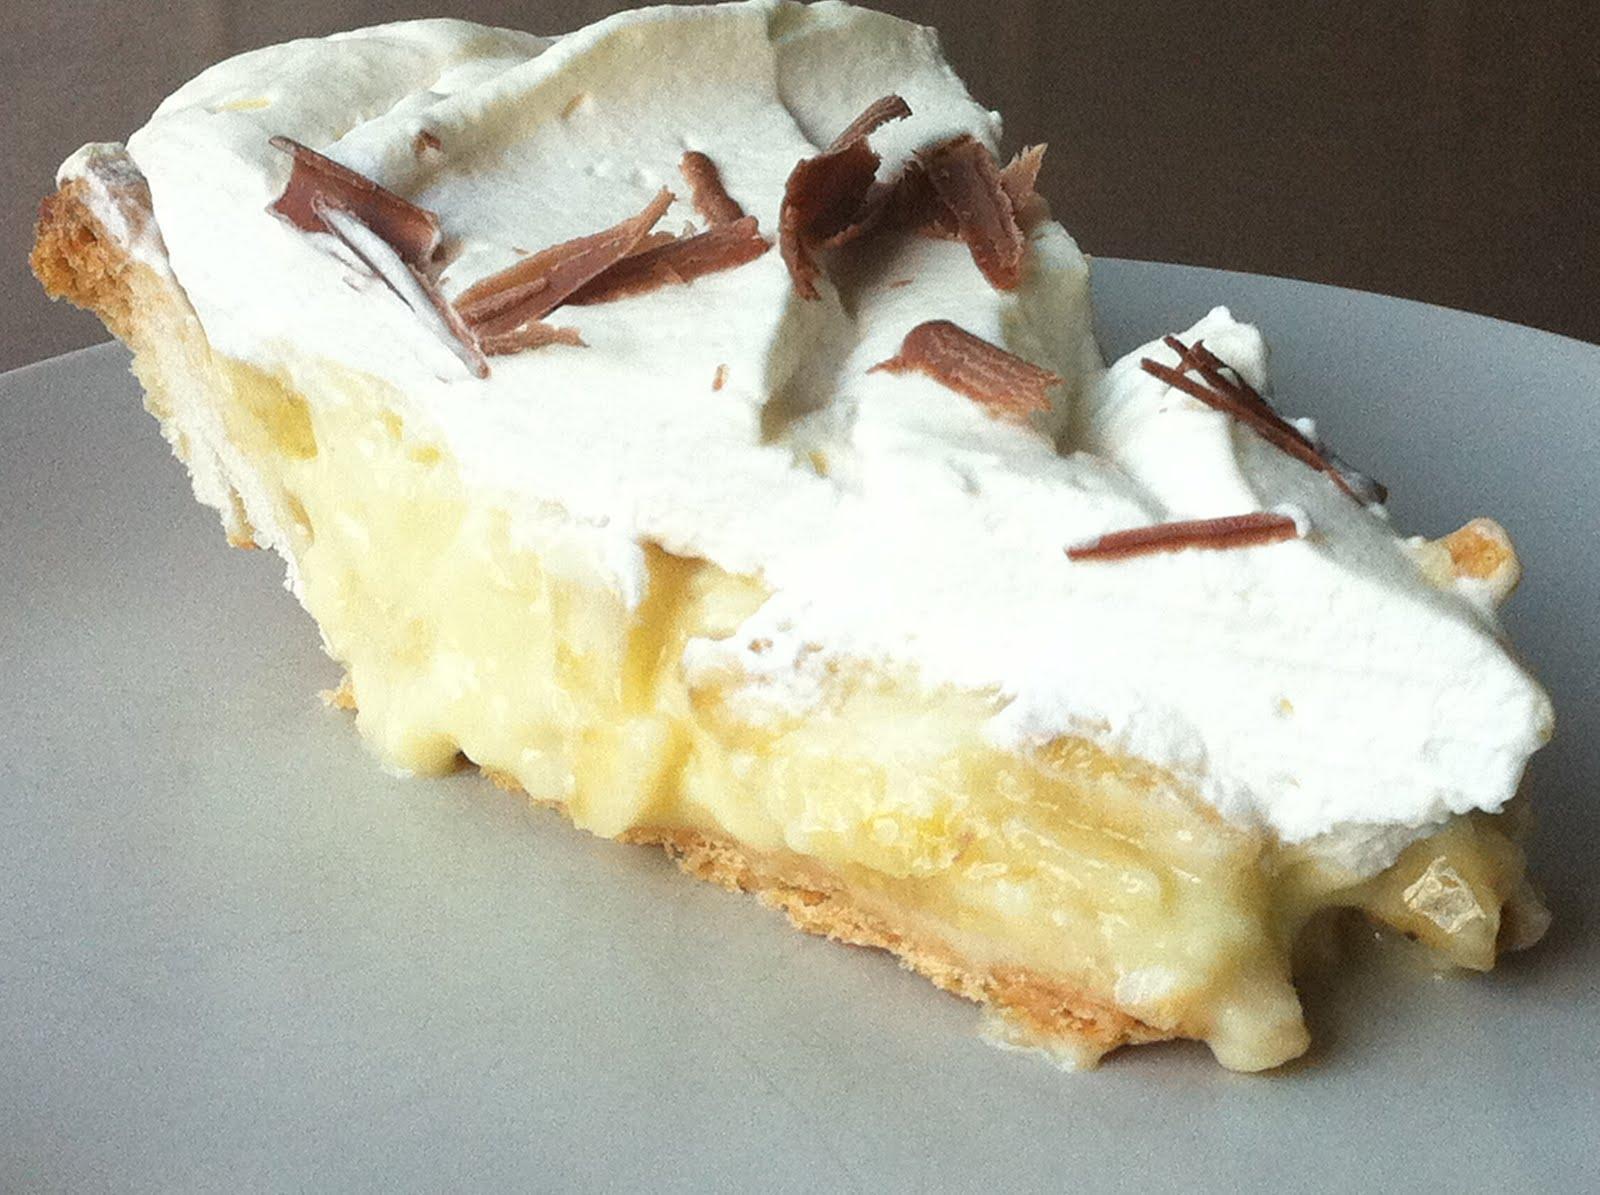 The Hobby that Made Me Chubby: Banana Cream Pie